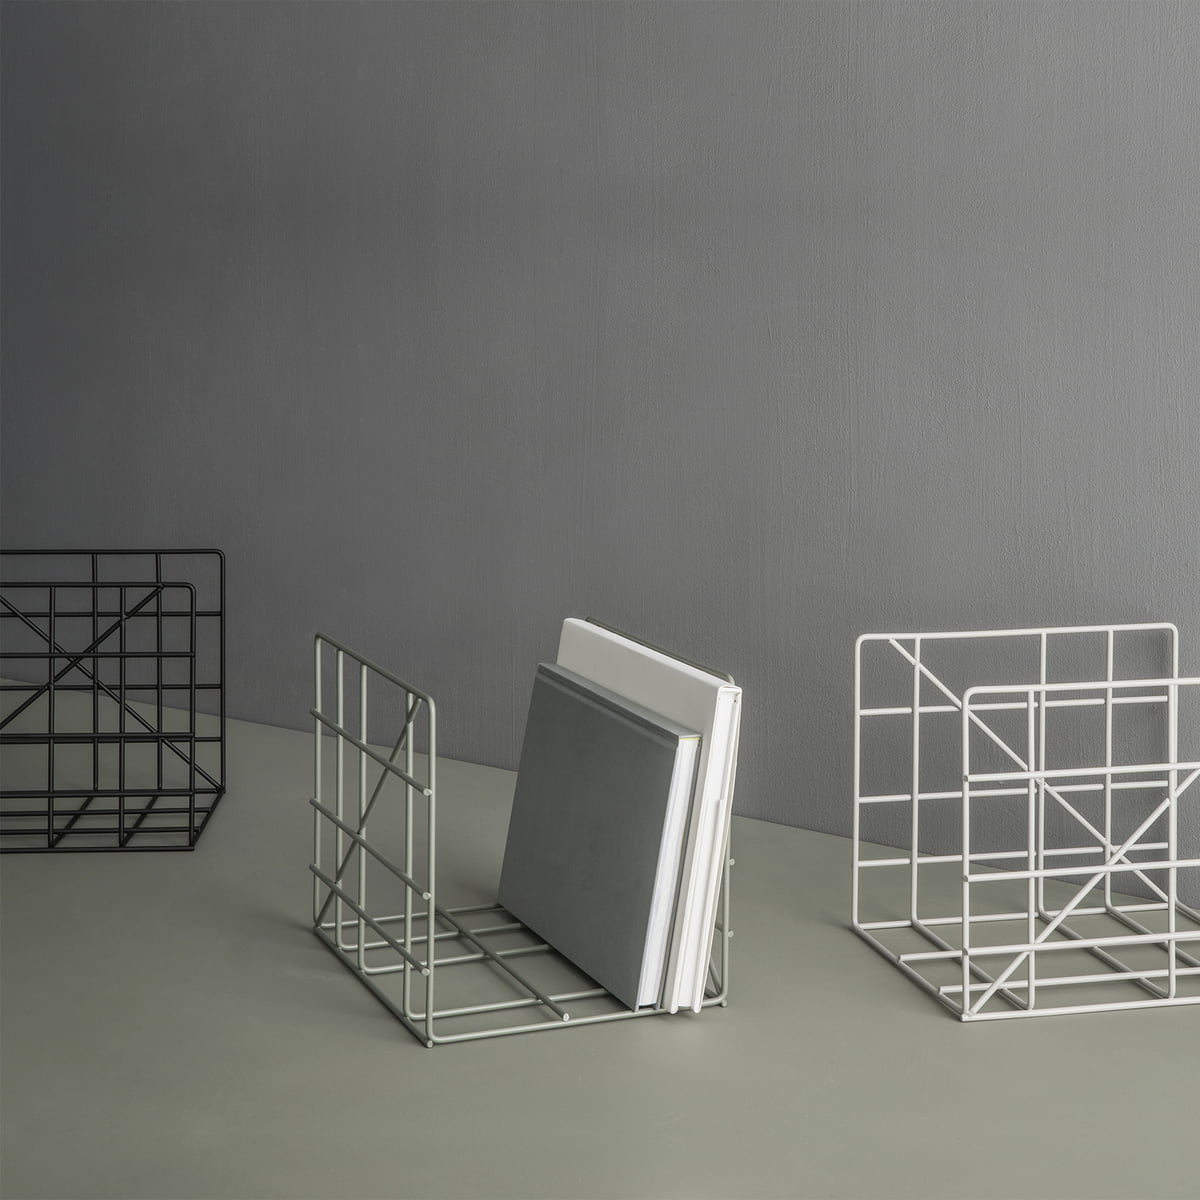 gitter magazinhalter von ferm living im shop. Black Bedroom Furniture Sets. Home Design Ideas